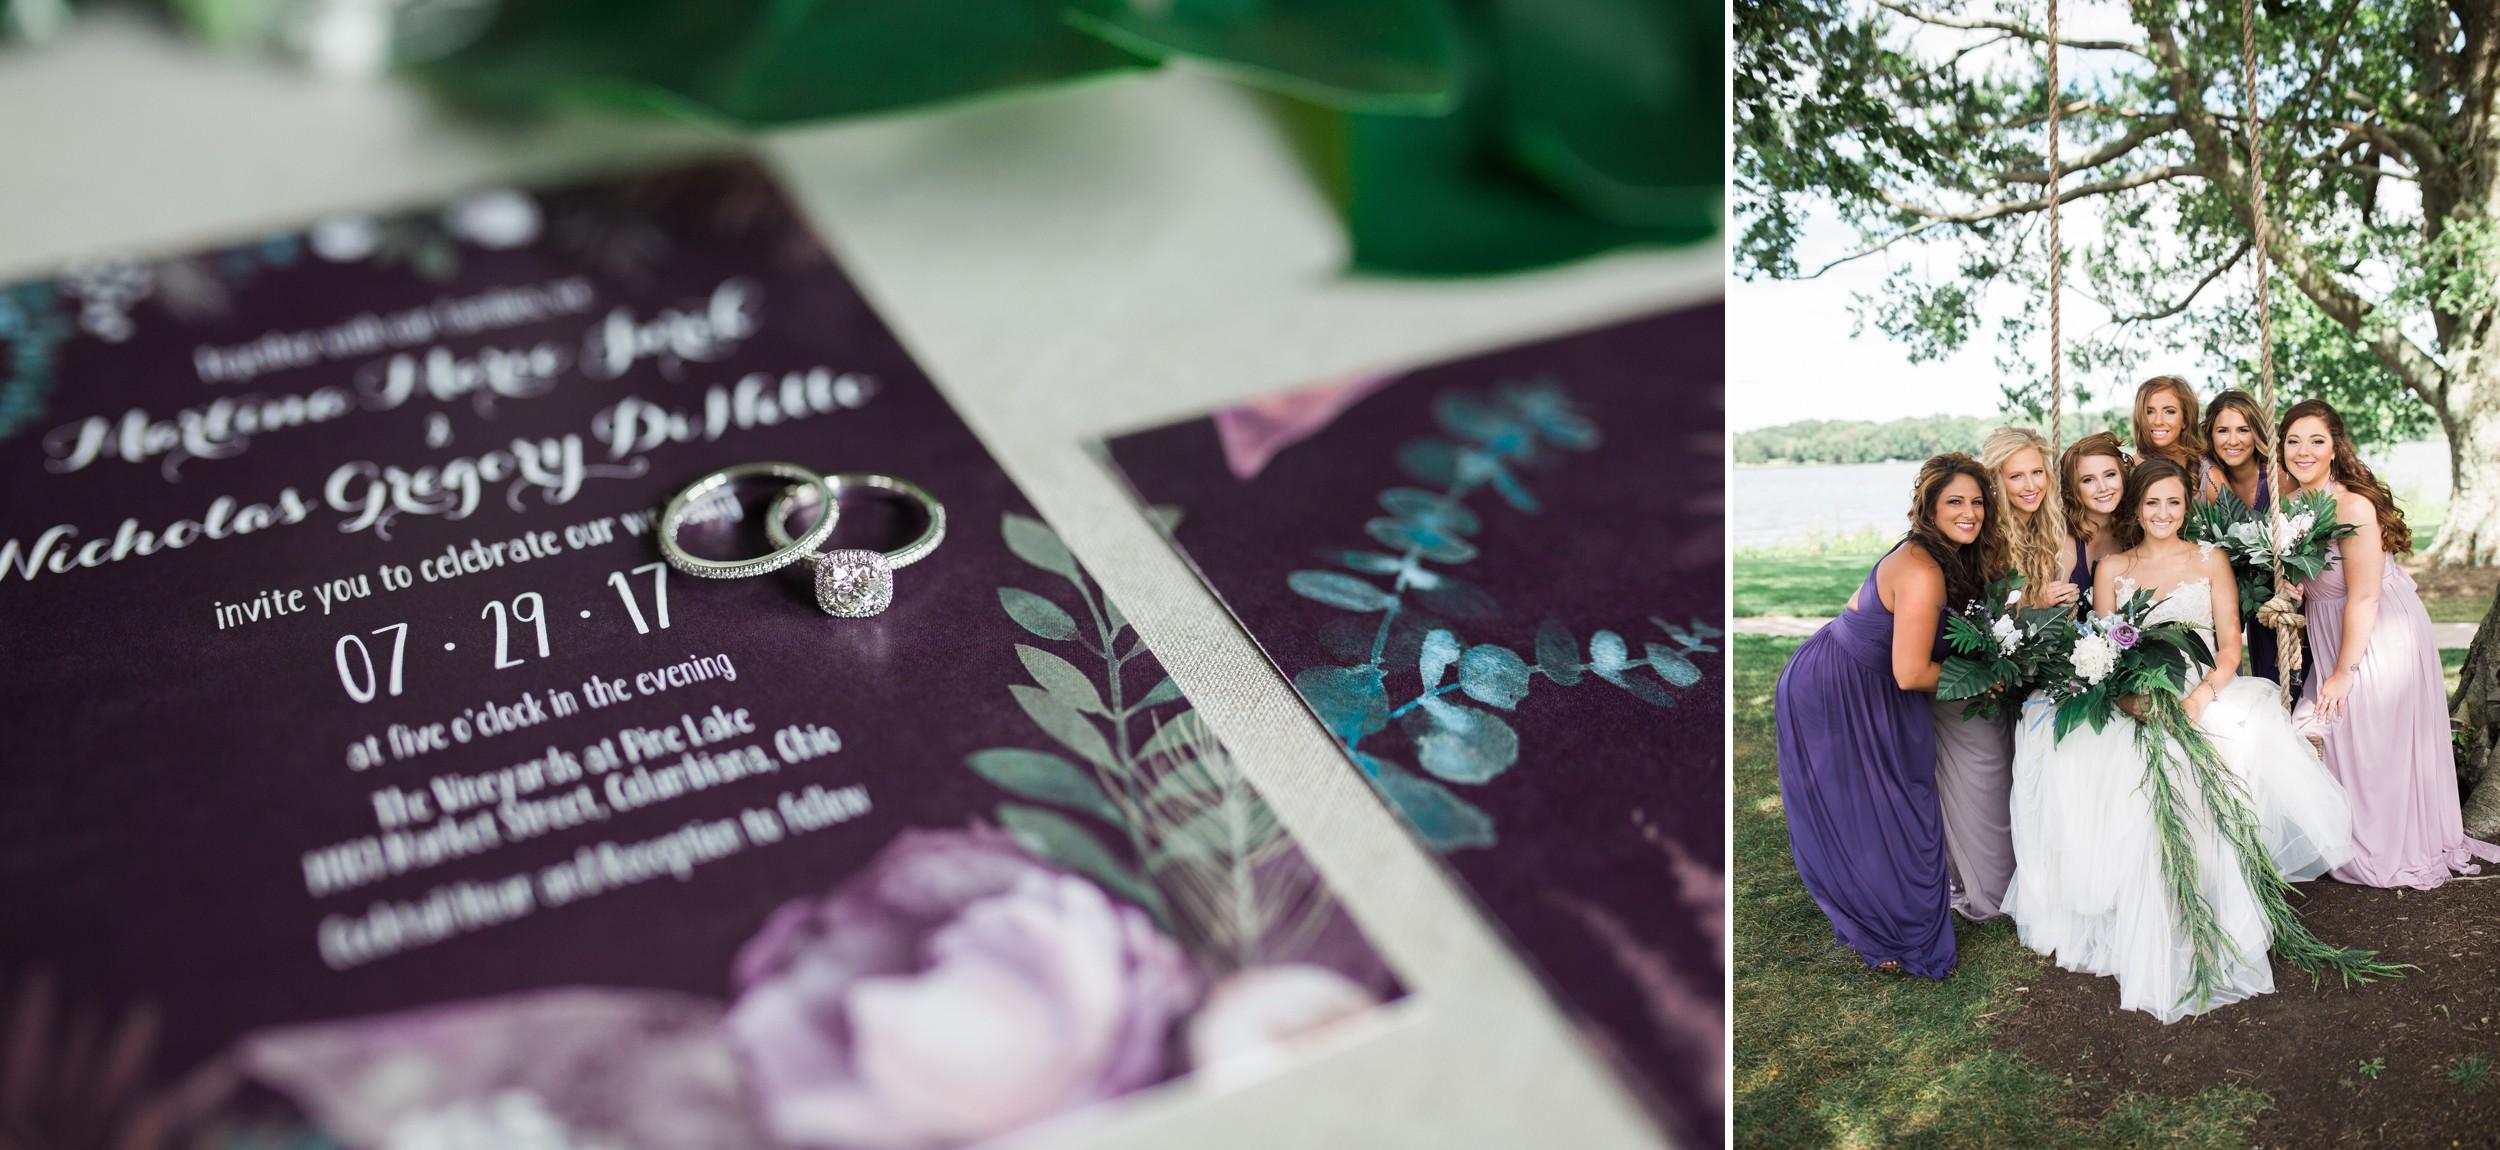 Nick-and-martina-pinelake-vinyards-wedding-columbiana-ohio-tracylynn-photography 10.jpg